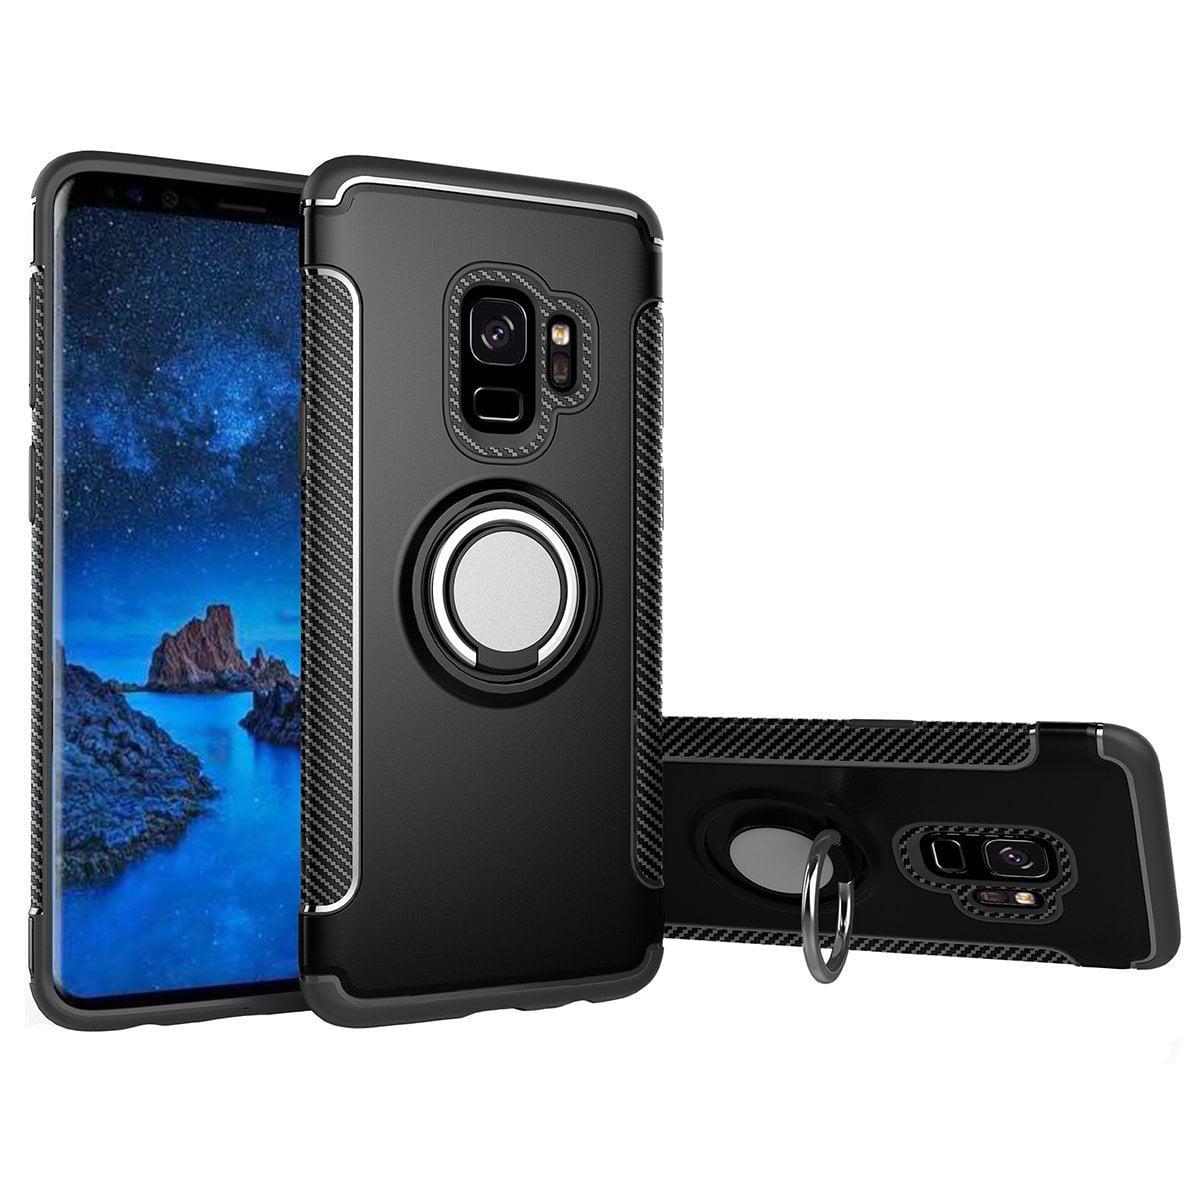 Mignova Galaxy S9 Case, Samsung Galaxy S9 Phone Case, Shock-Absorption Anti-scratch Slim Protective Cover Case with Ring Bracket Kickstand for Galaxy S9 2018 / G960U / G960F (Black)